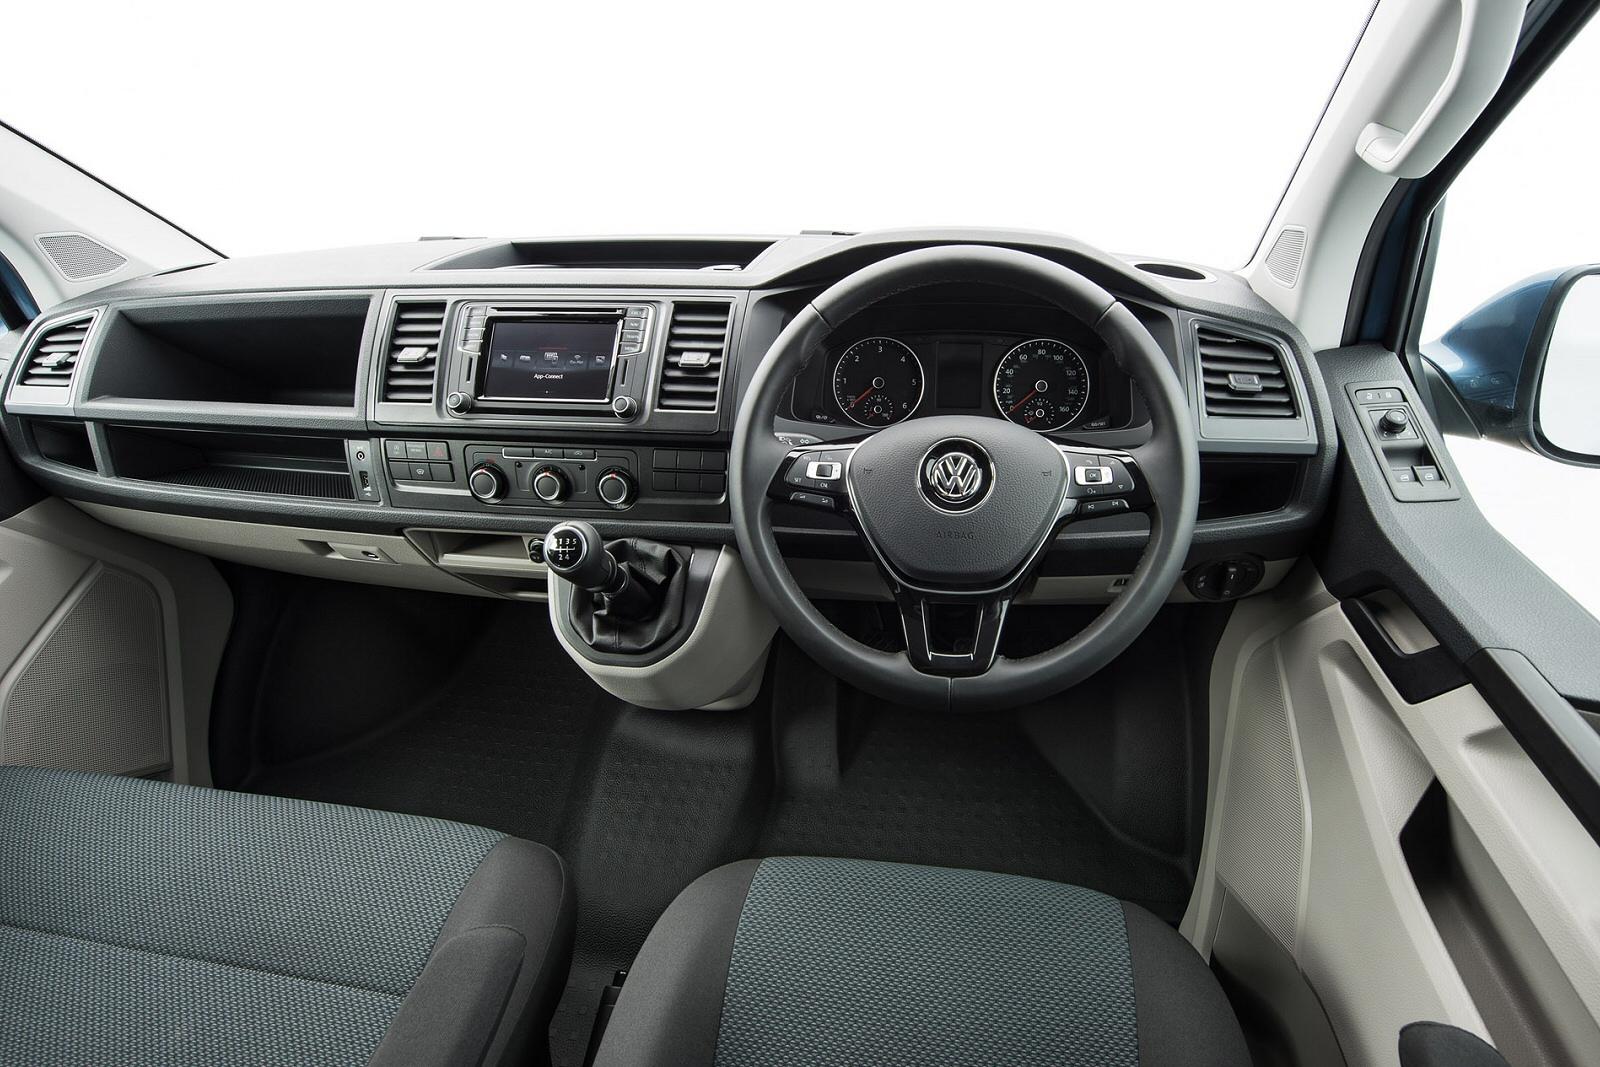 c62ffe35fa New Volkswagen Transporter T28 Swb Diesel 2.0 TDI BMT 102 Highline ...